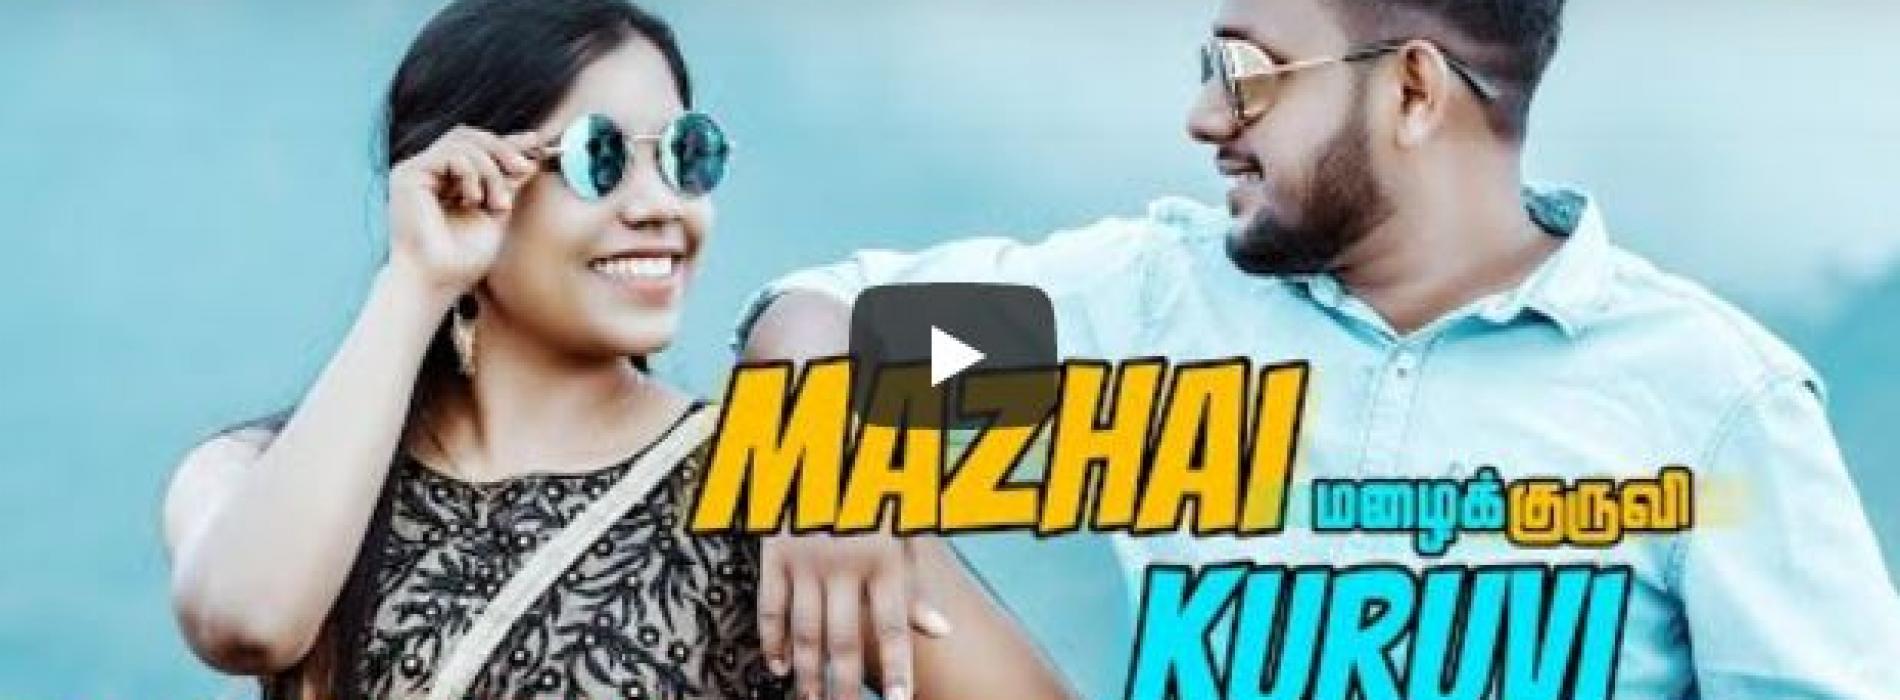 New Music : Mazhai Kuruvi Official Music Video   Praveen   Yadusha  Cv Laksh  Doo films  Shameel J  Aakko Ranil